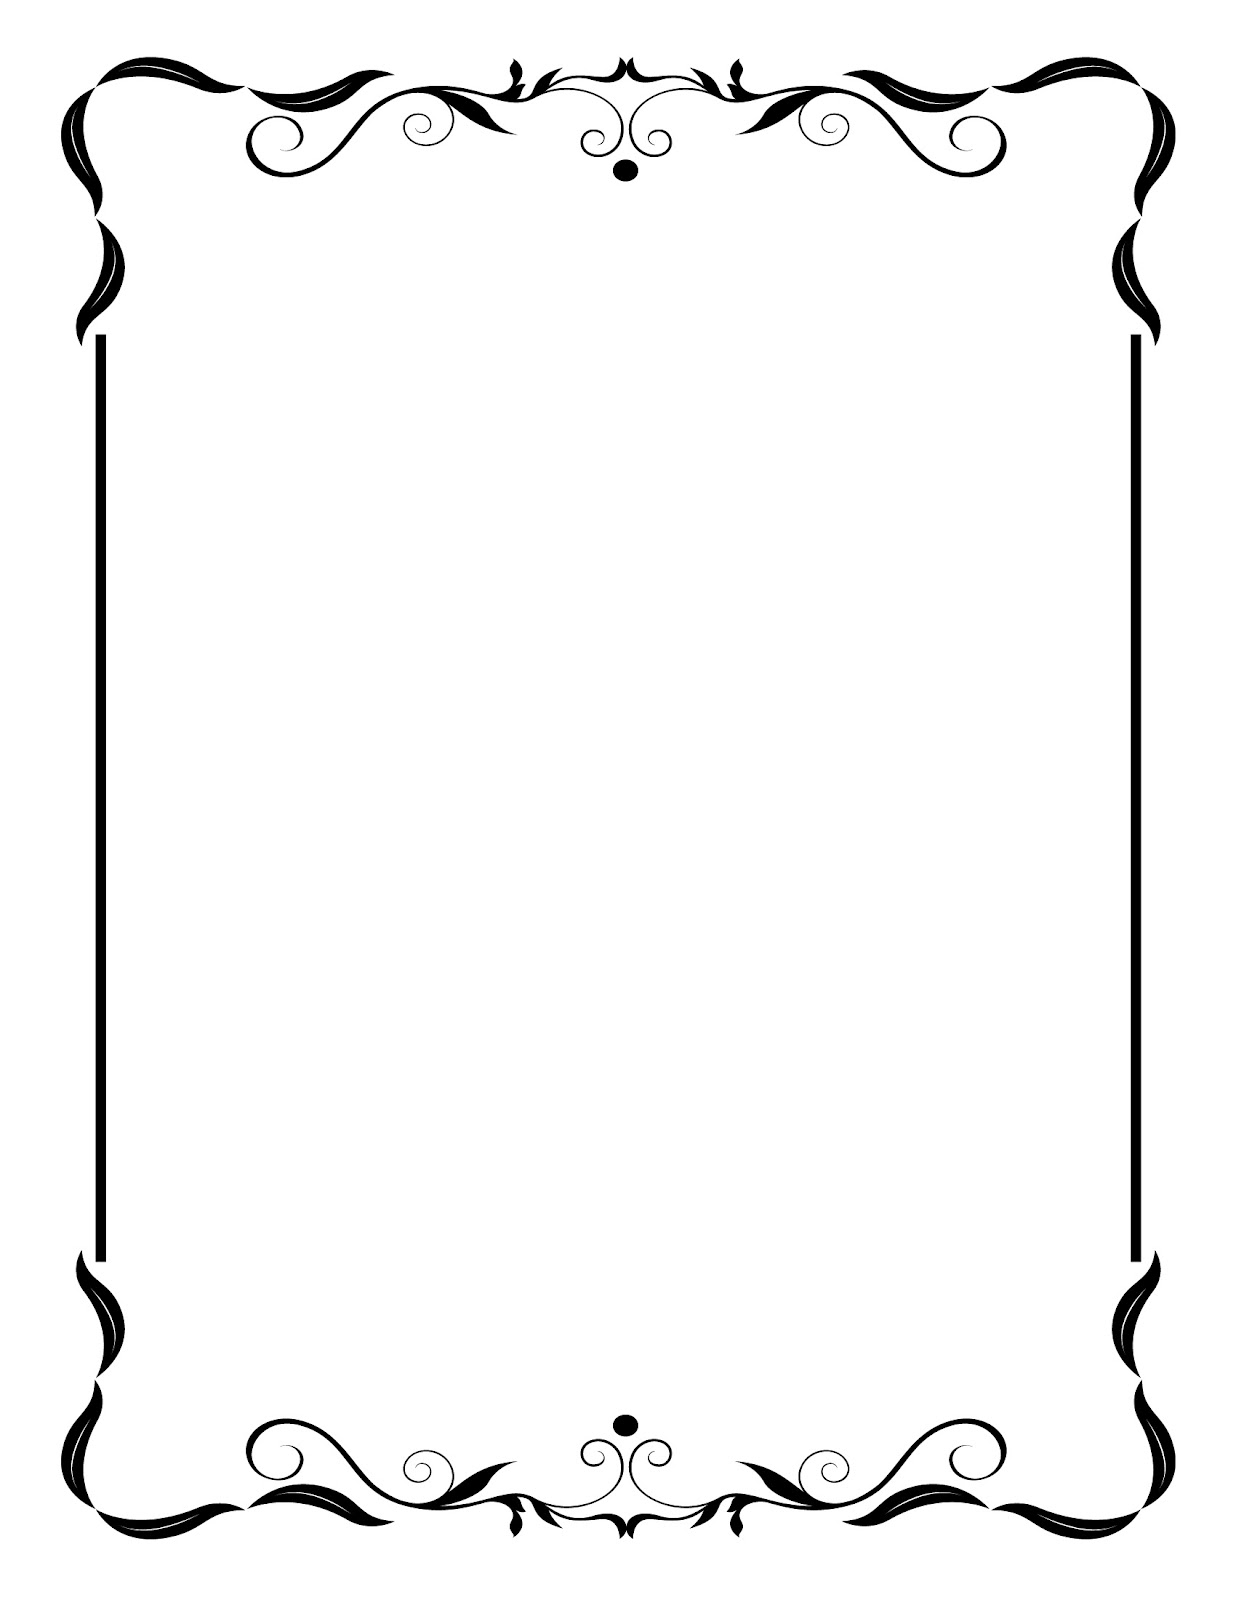 Border Free Frame Clip Art Teaching Clip Art Free Frames